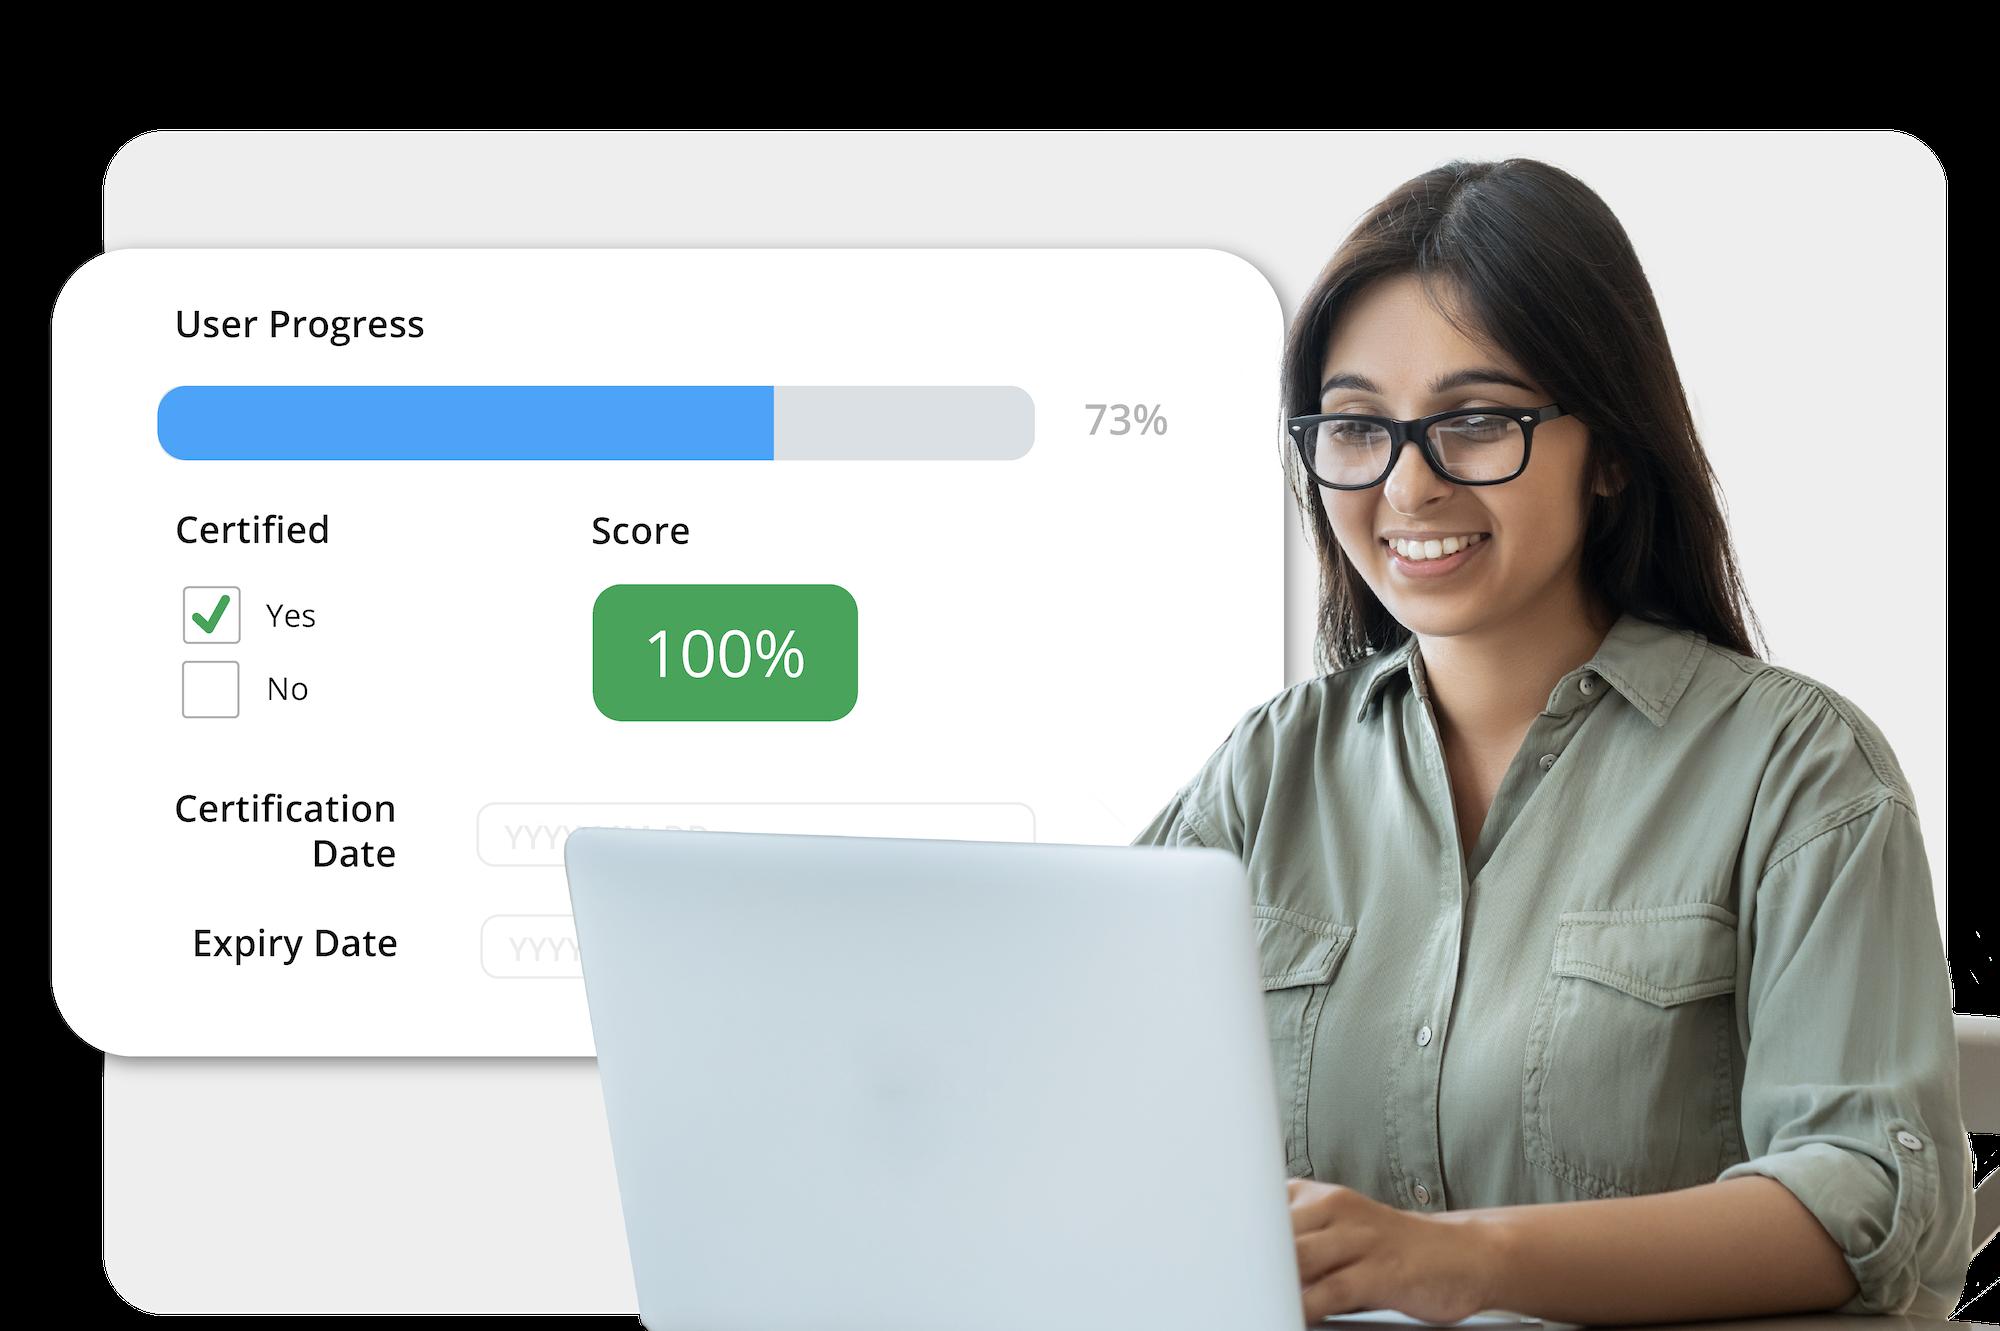 Young woman using laptop reviewing user progress